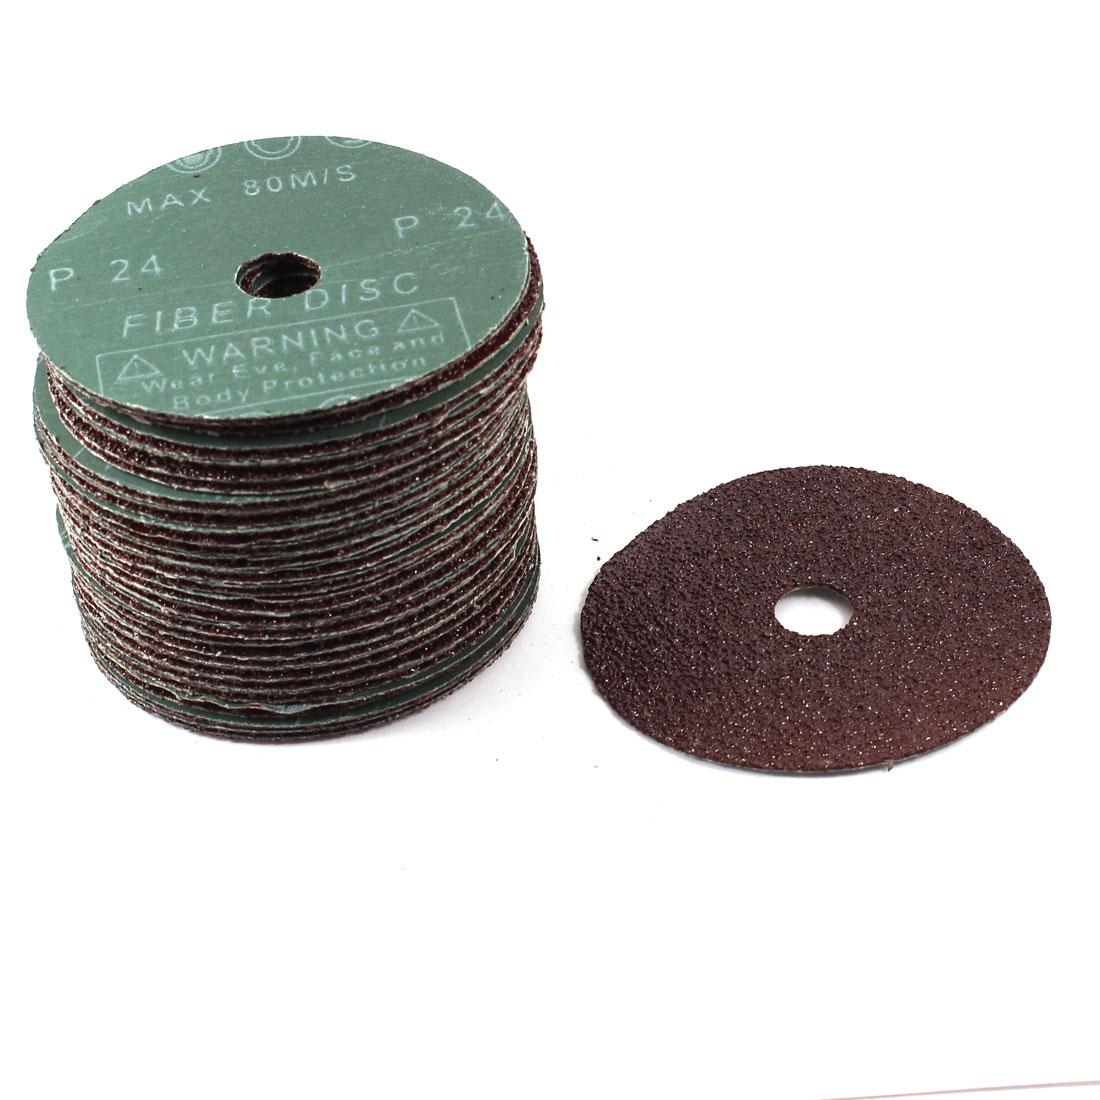 P24 Slice Grinding Disc Cutting Wheel Tool 100mm x 16mm x 1.4mm 50pcs